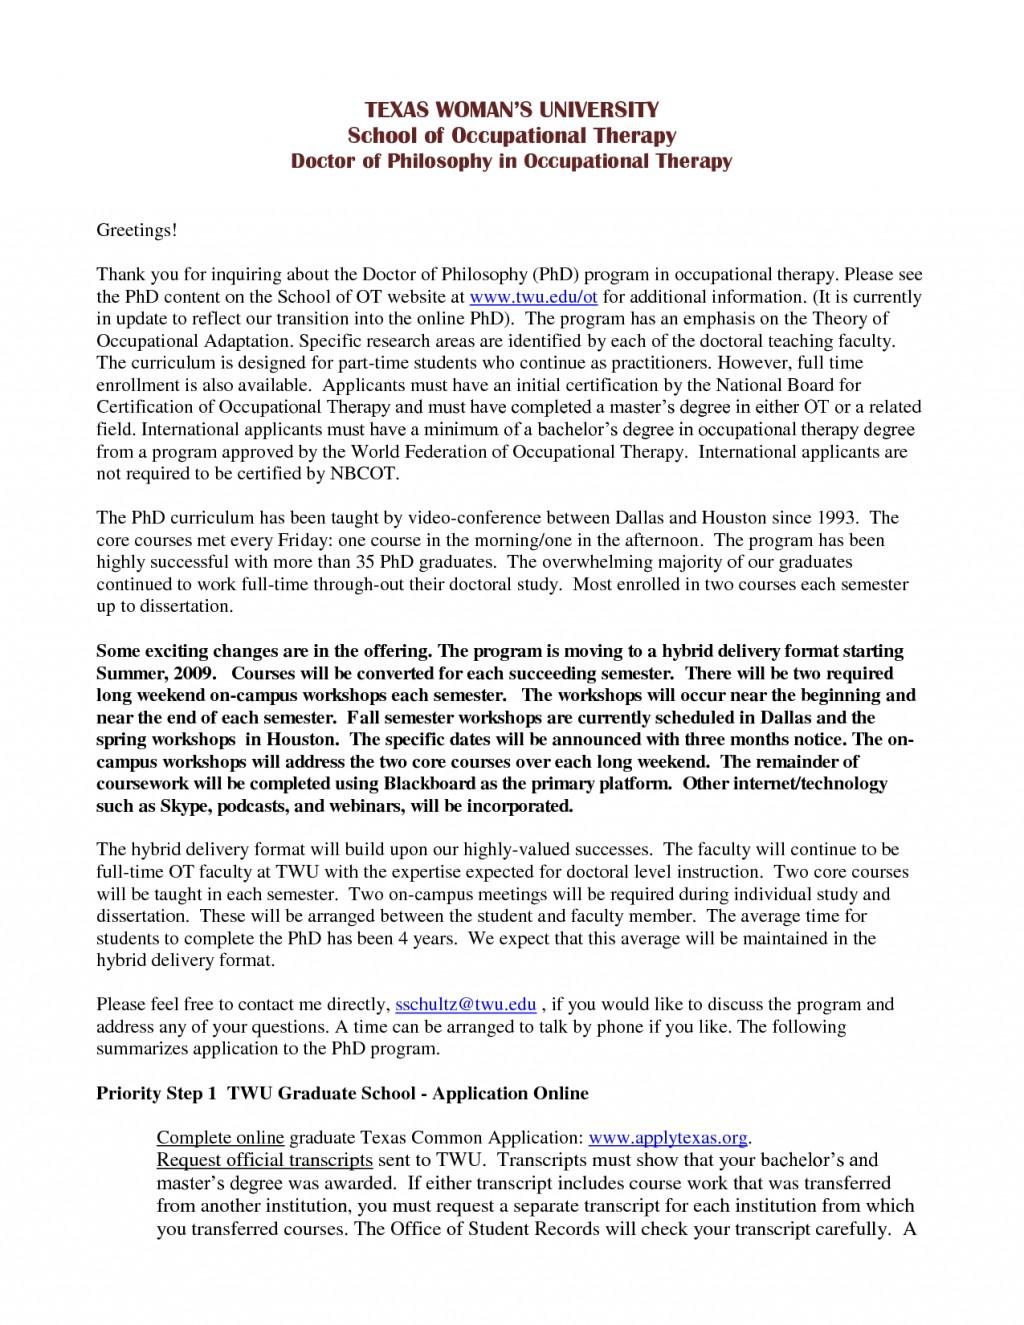 013 Essay Example P2nuwjbgnb Act Incredible Tips Prepscholar Large